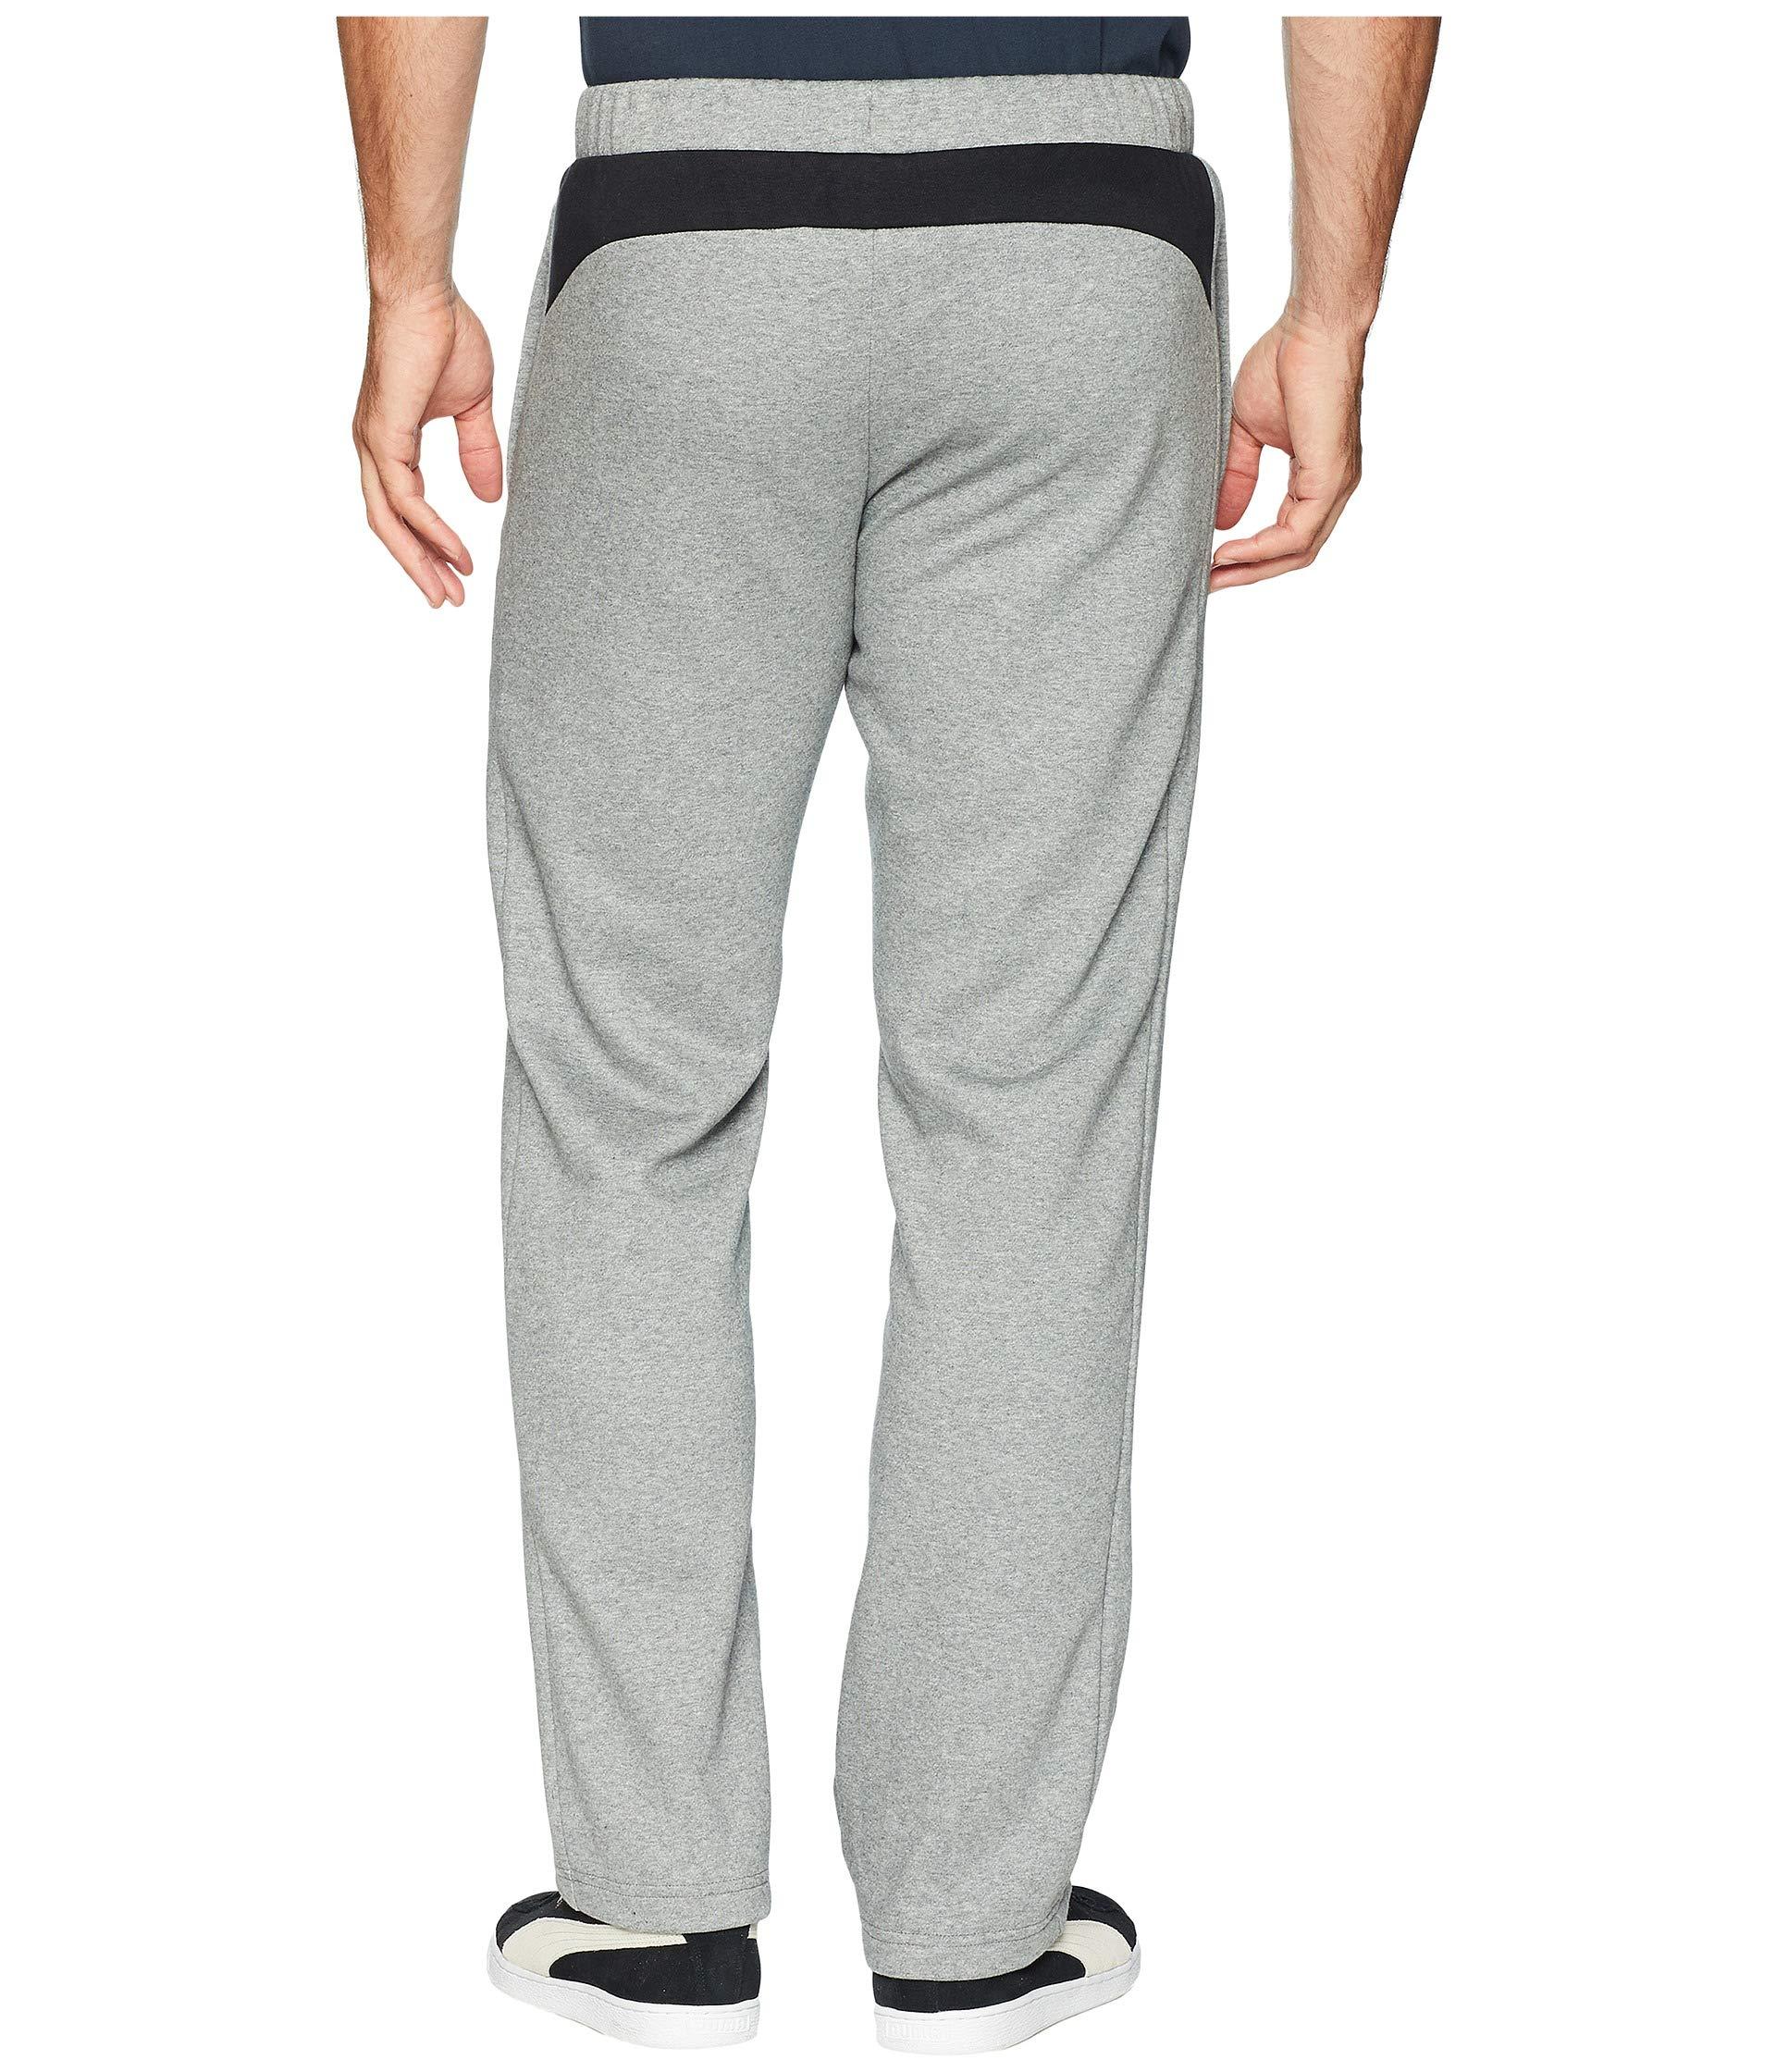 Medium Modern Open Sports P48 Heather Fleece Pants Grey Puma w4PqU1xYn